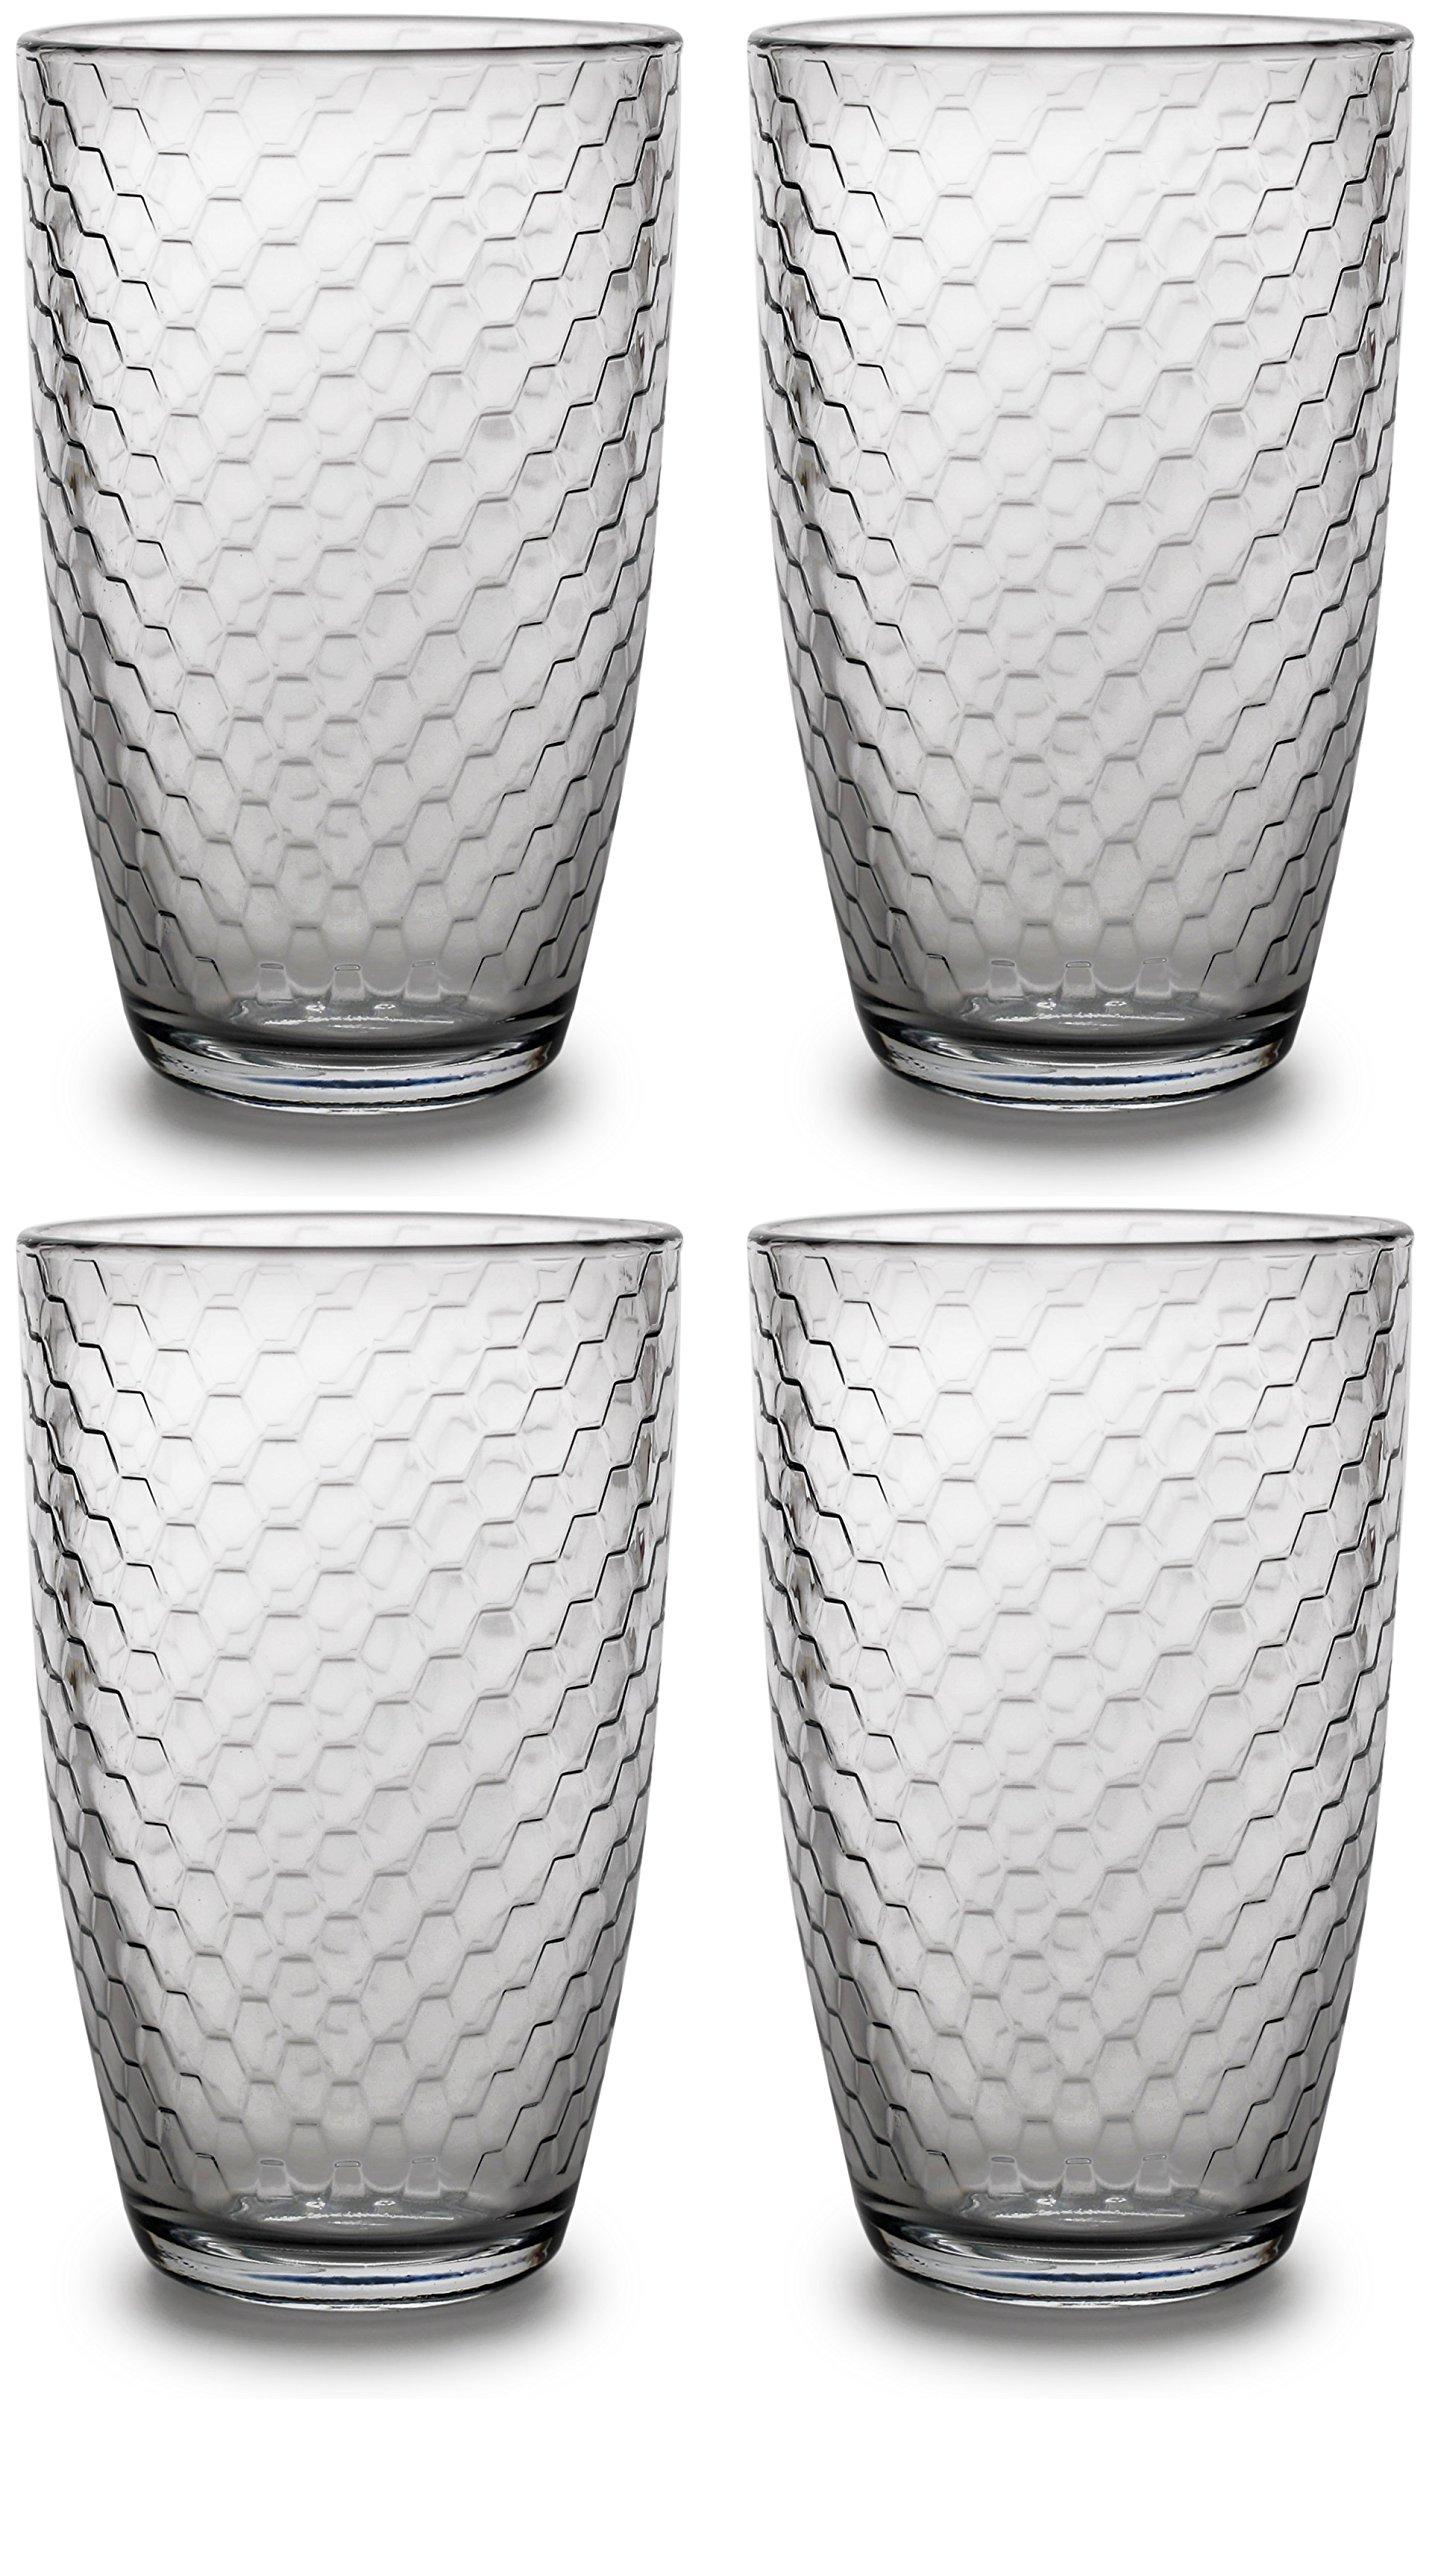 Circleware Hive Drinking Glasses Set of 4, 16 ounce, Hive Editon